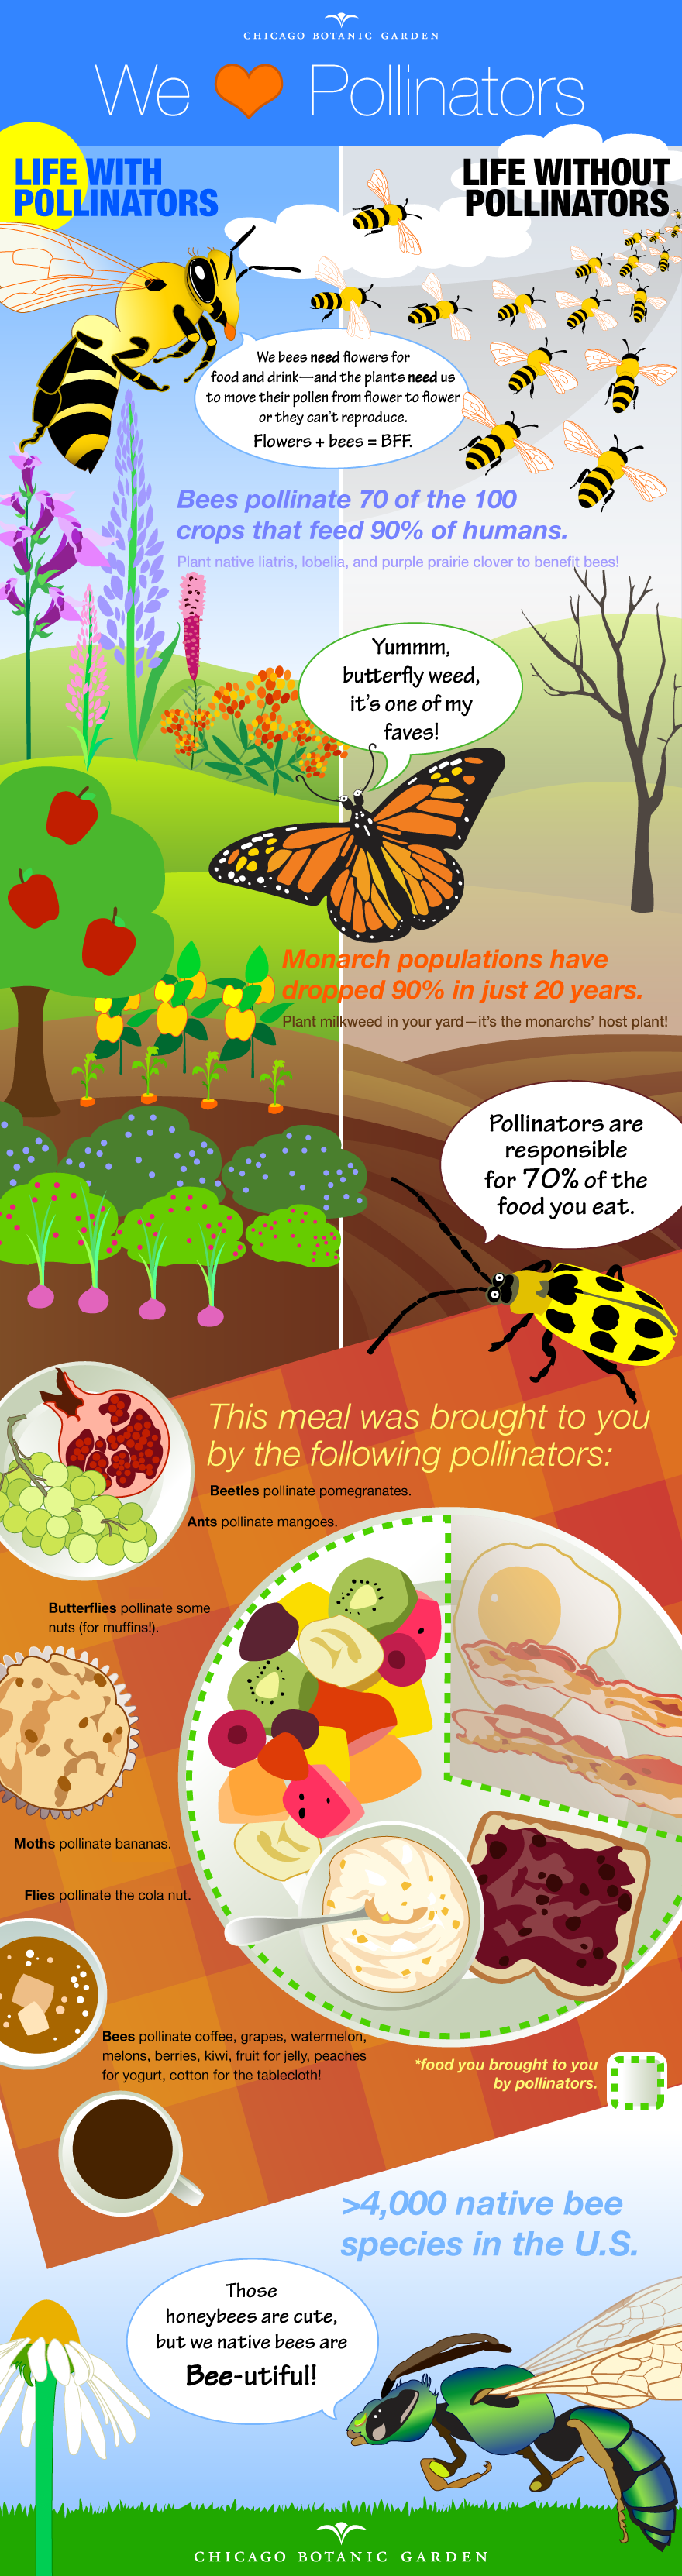 infographic pollinators wed